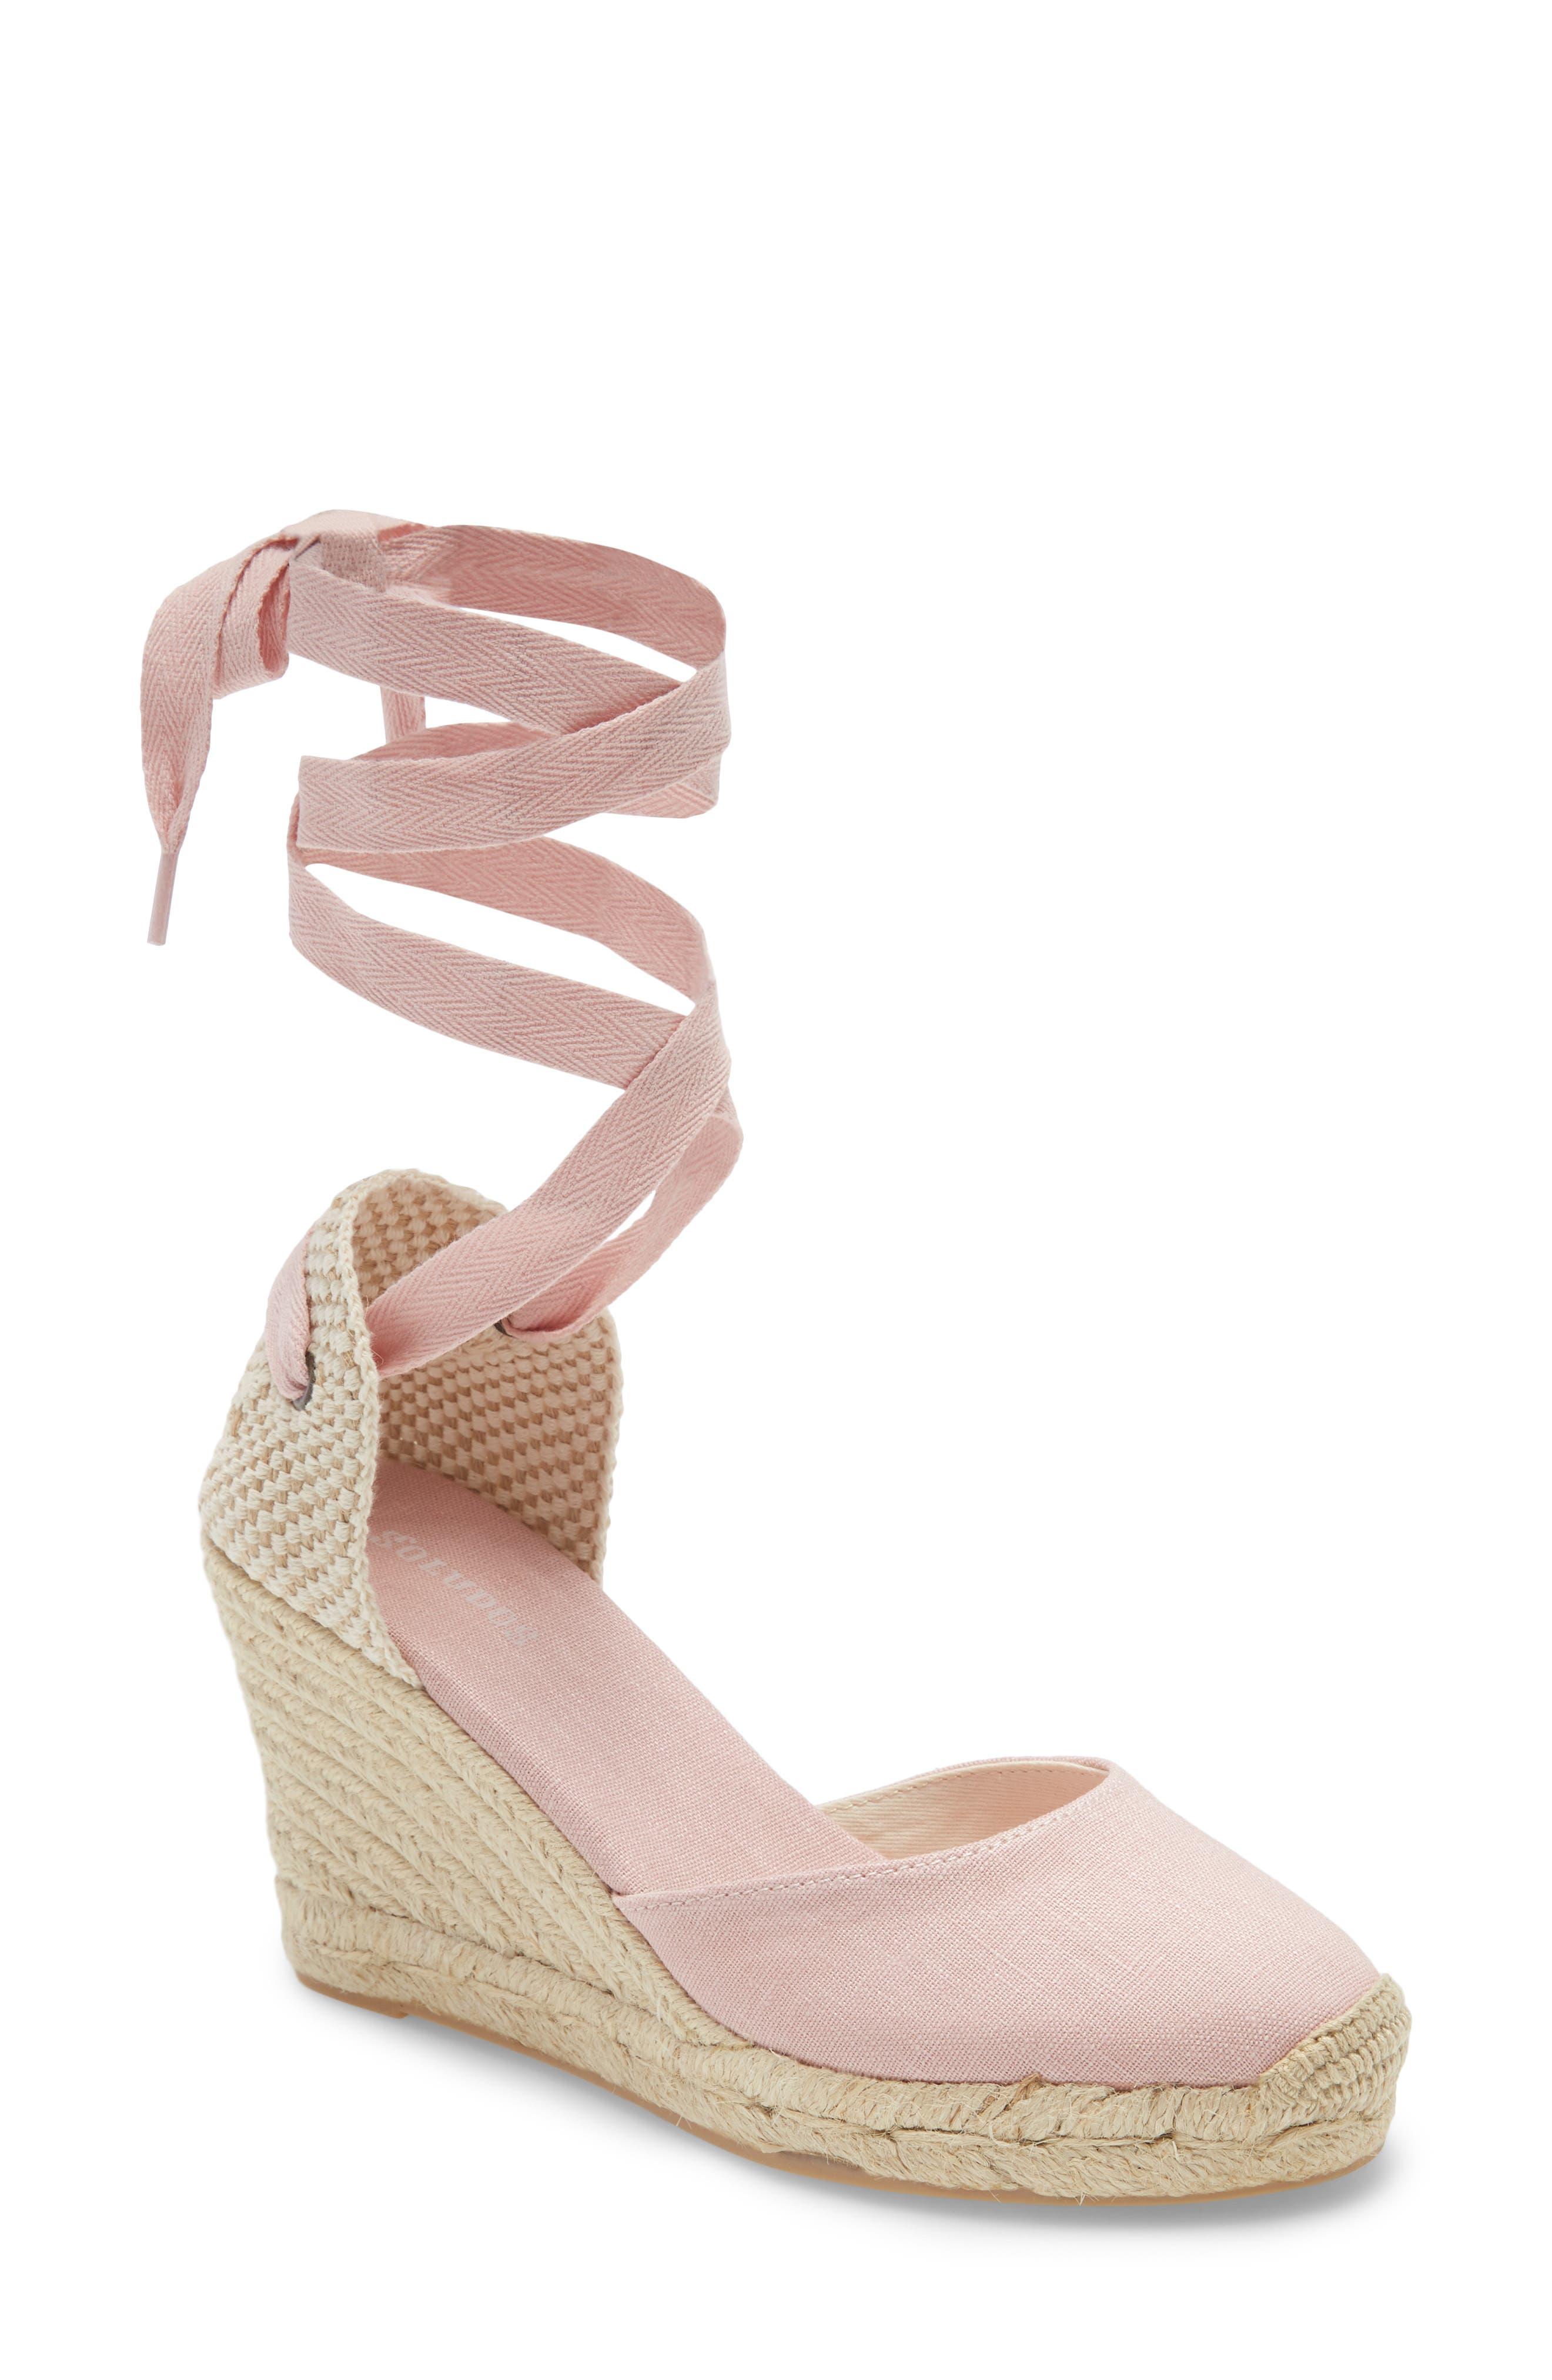 Women's Pink Espadrille Sandals   Nordstrom